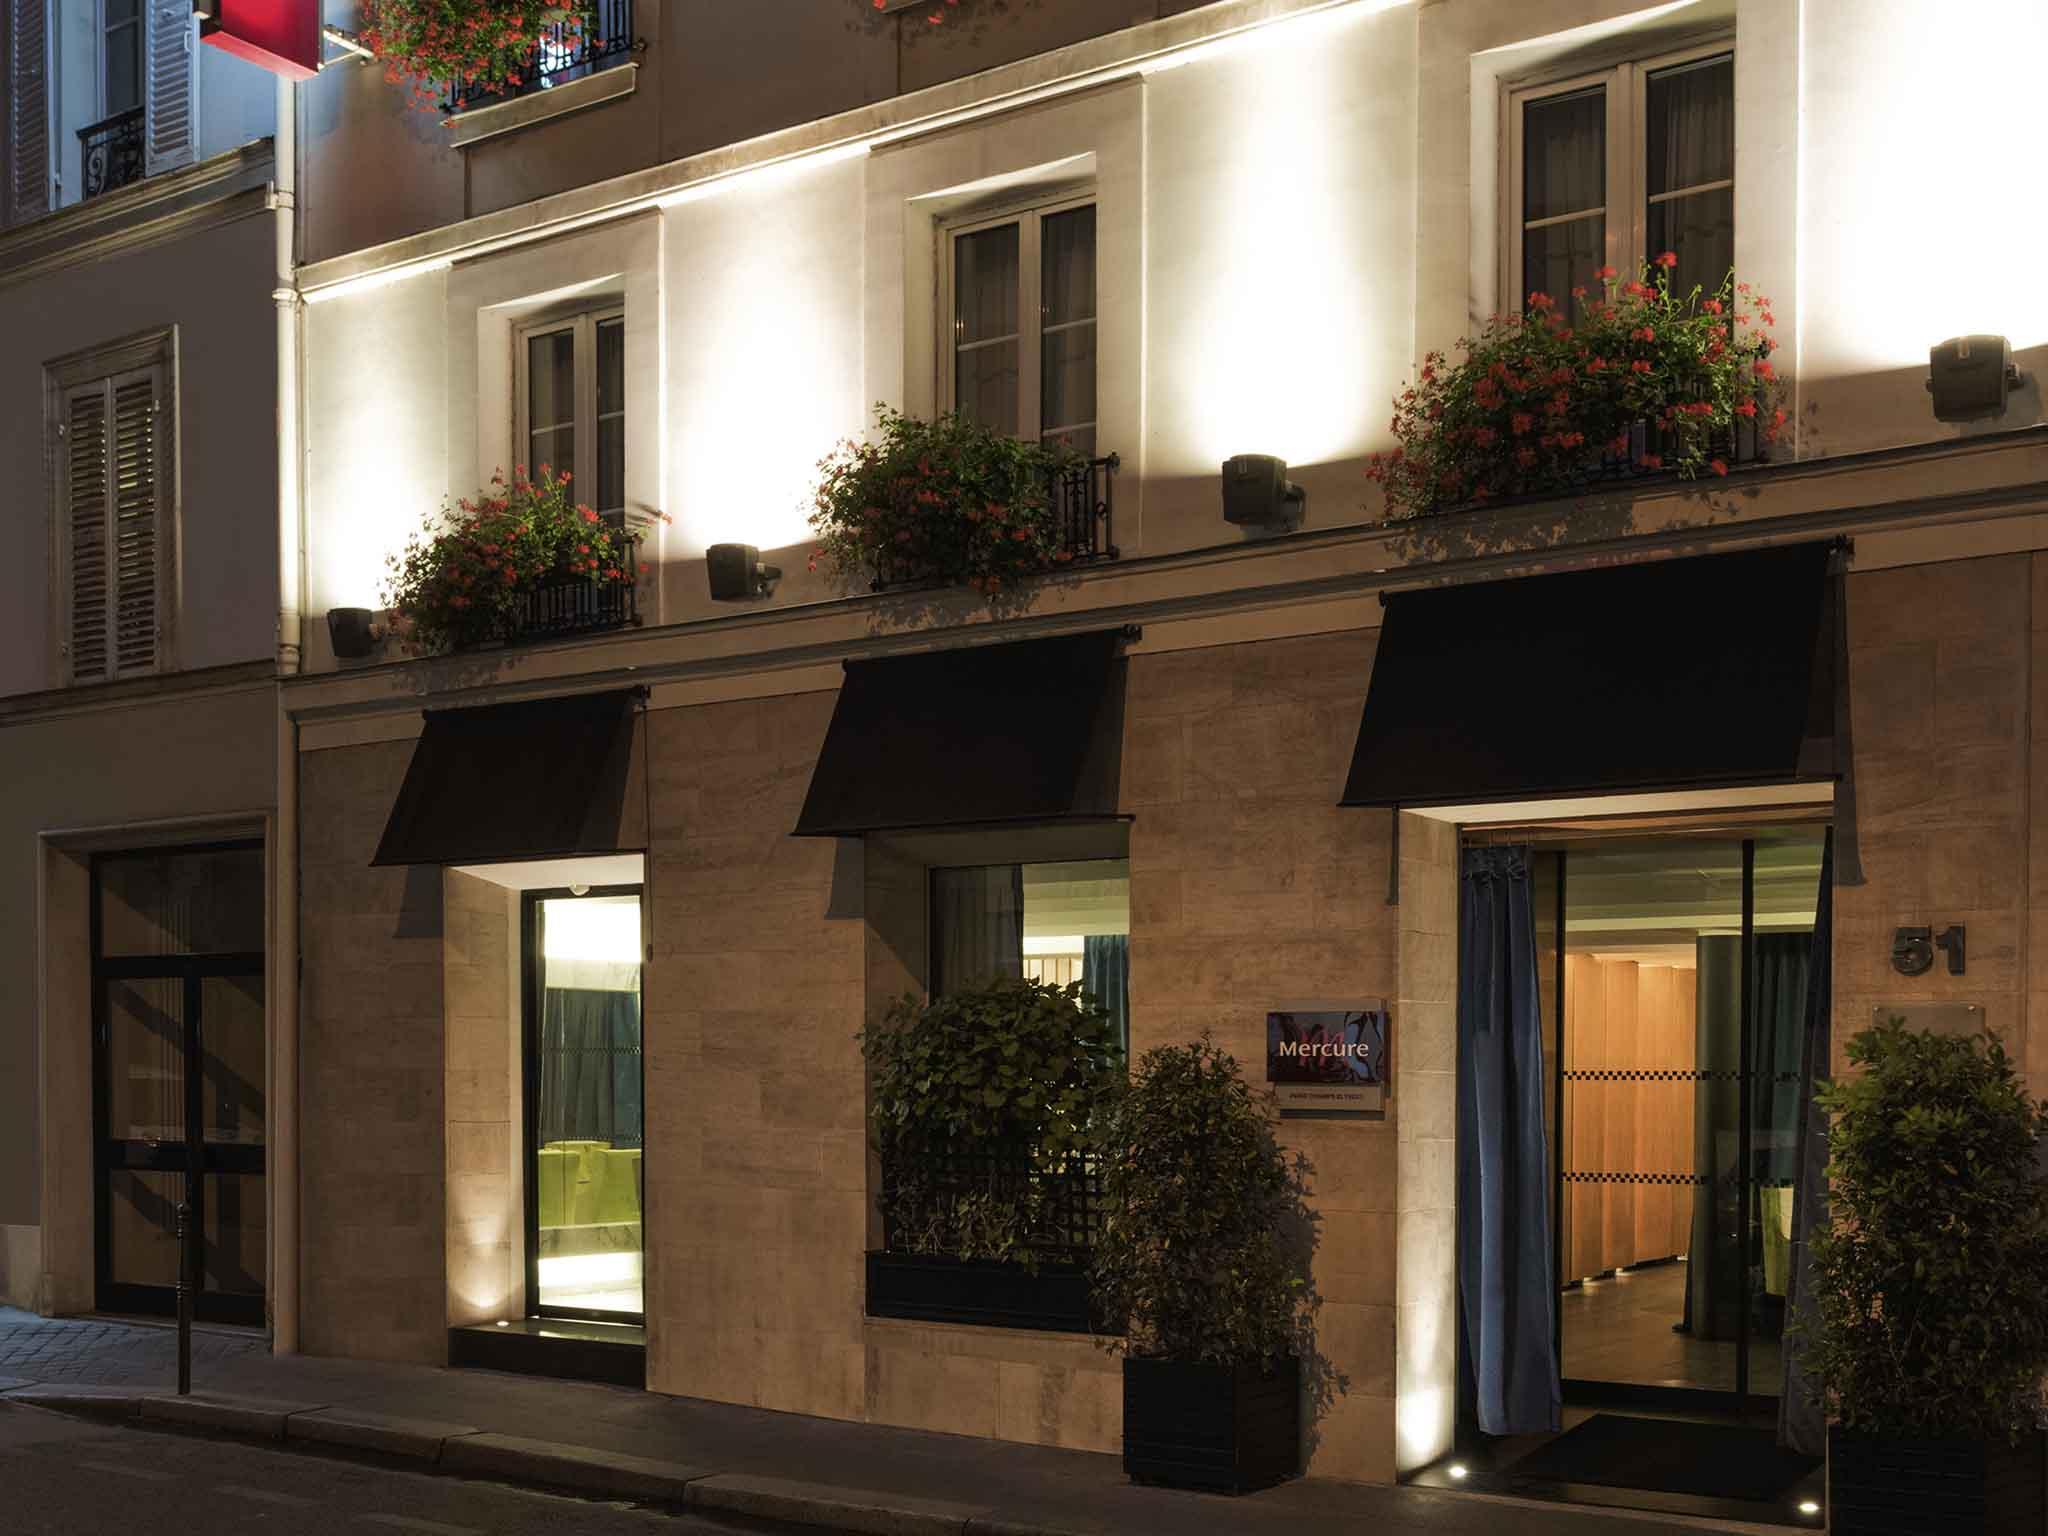 Hotel Des Champs Elysees Hotel In Paris Mercure Paris Champs Elysaces Hotel